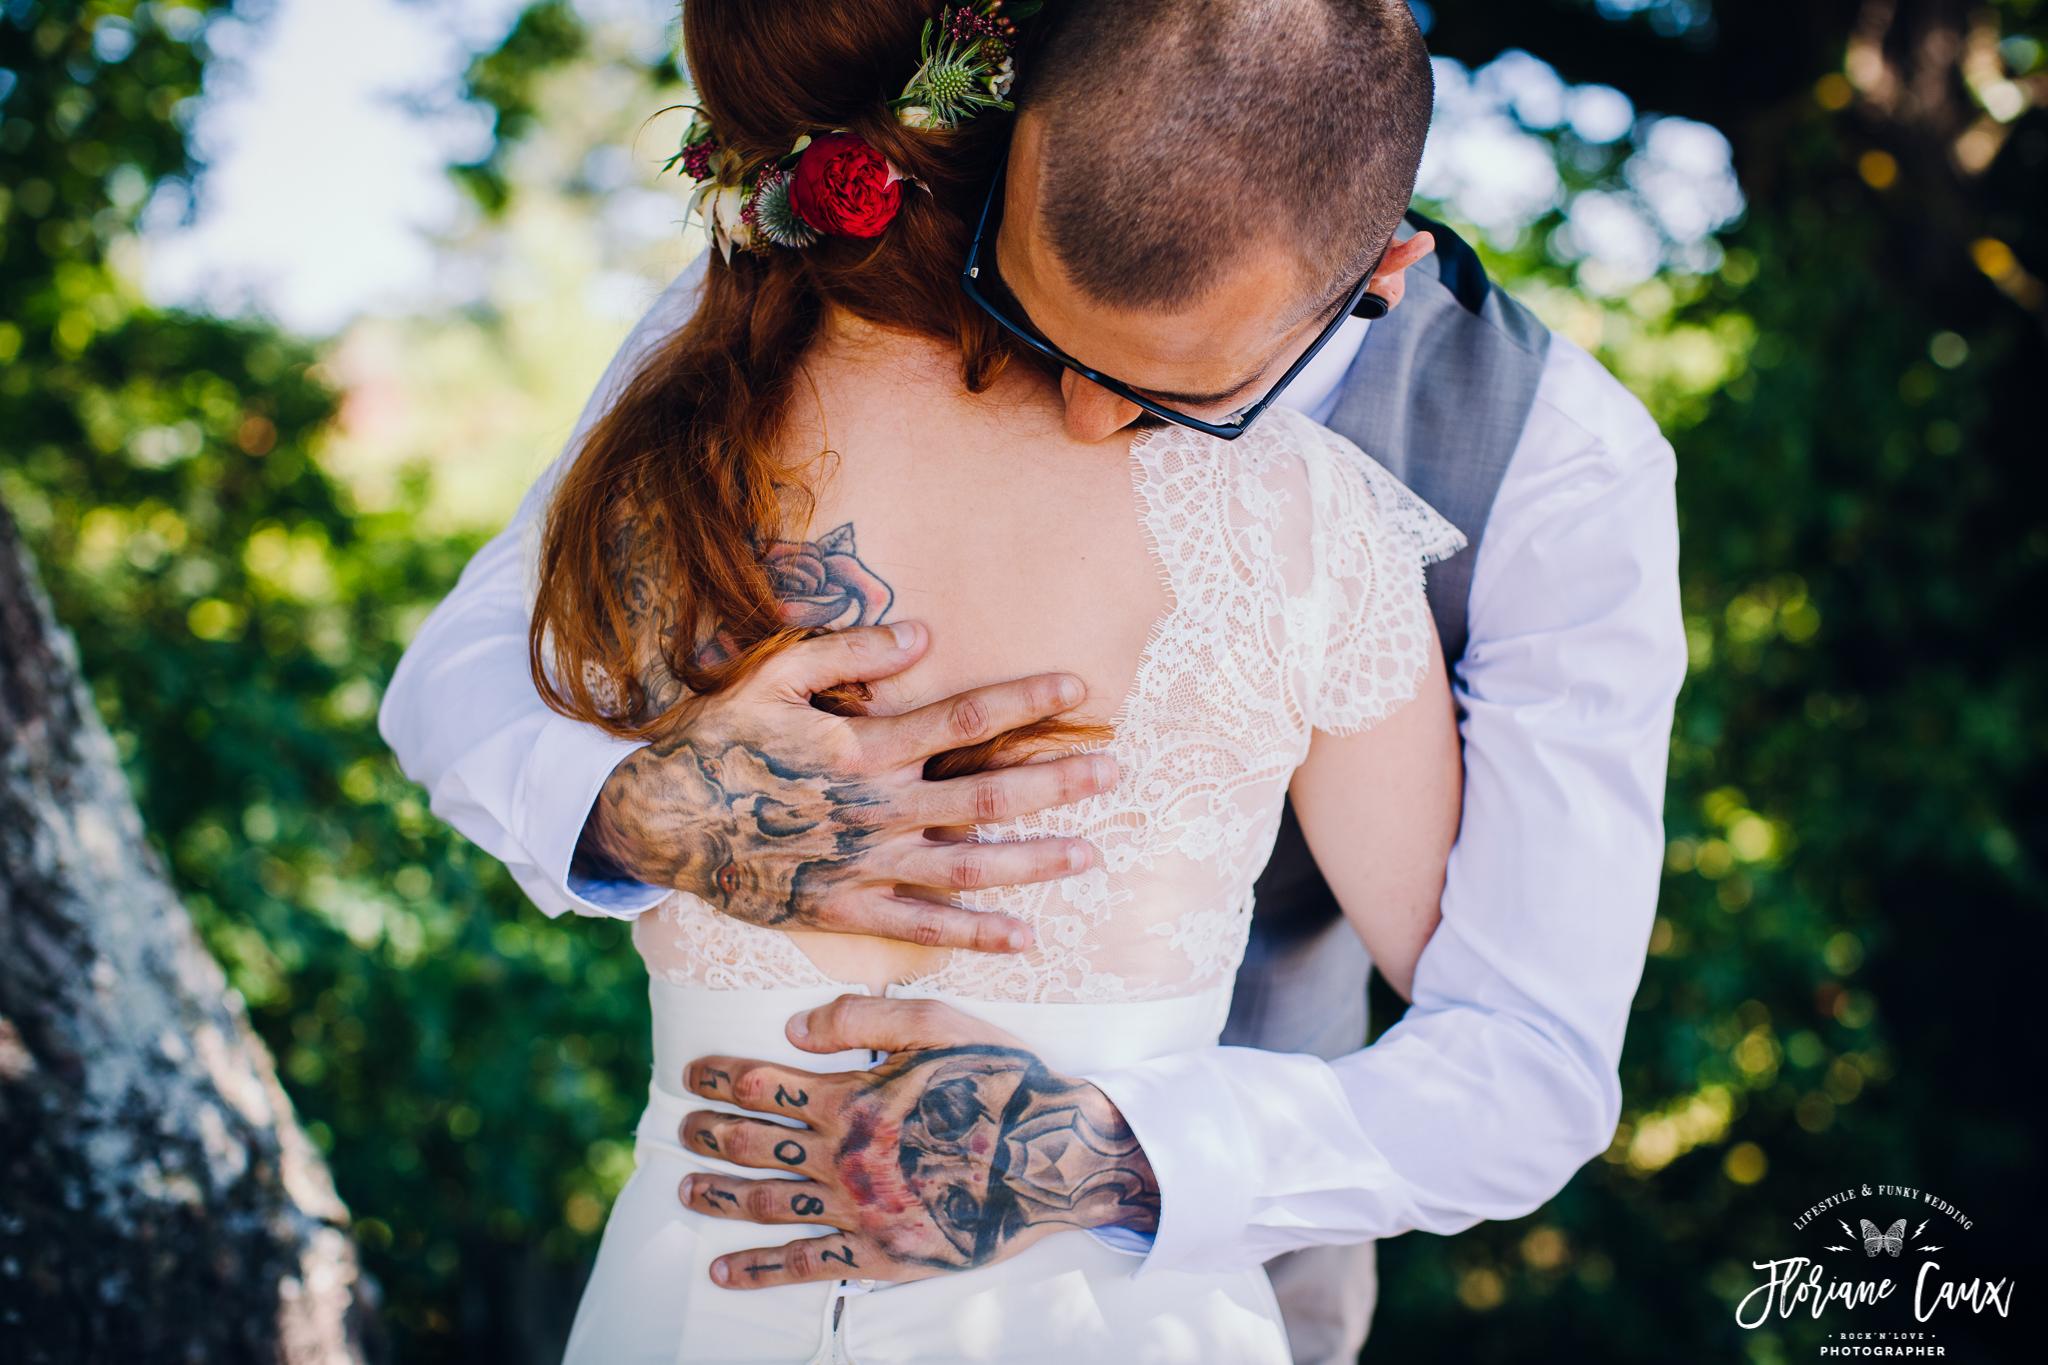 photographe-mariage-toulouse-rocknroll-maries-tatoues-floriane-caux-20